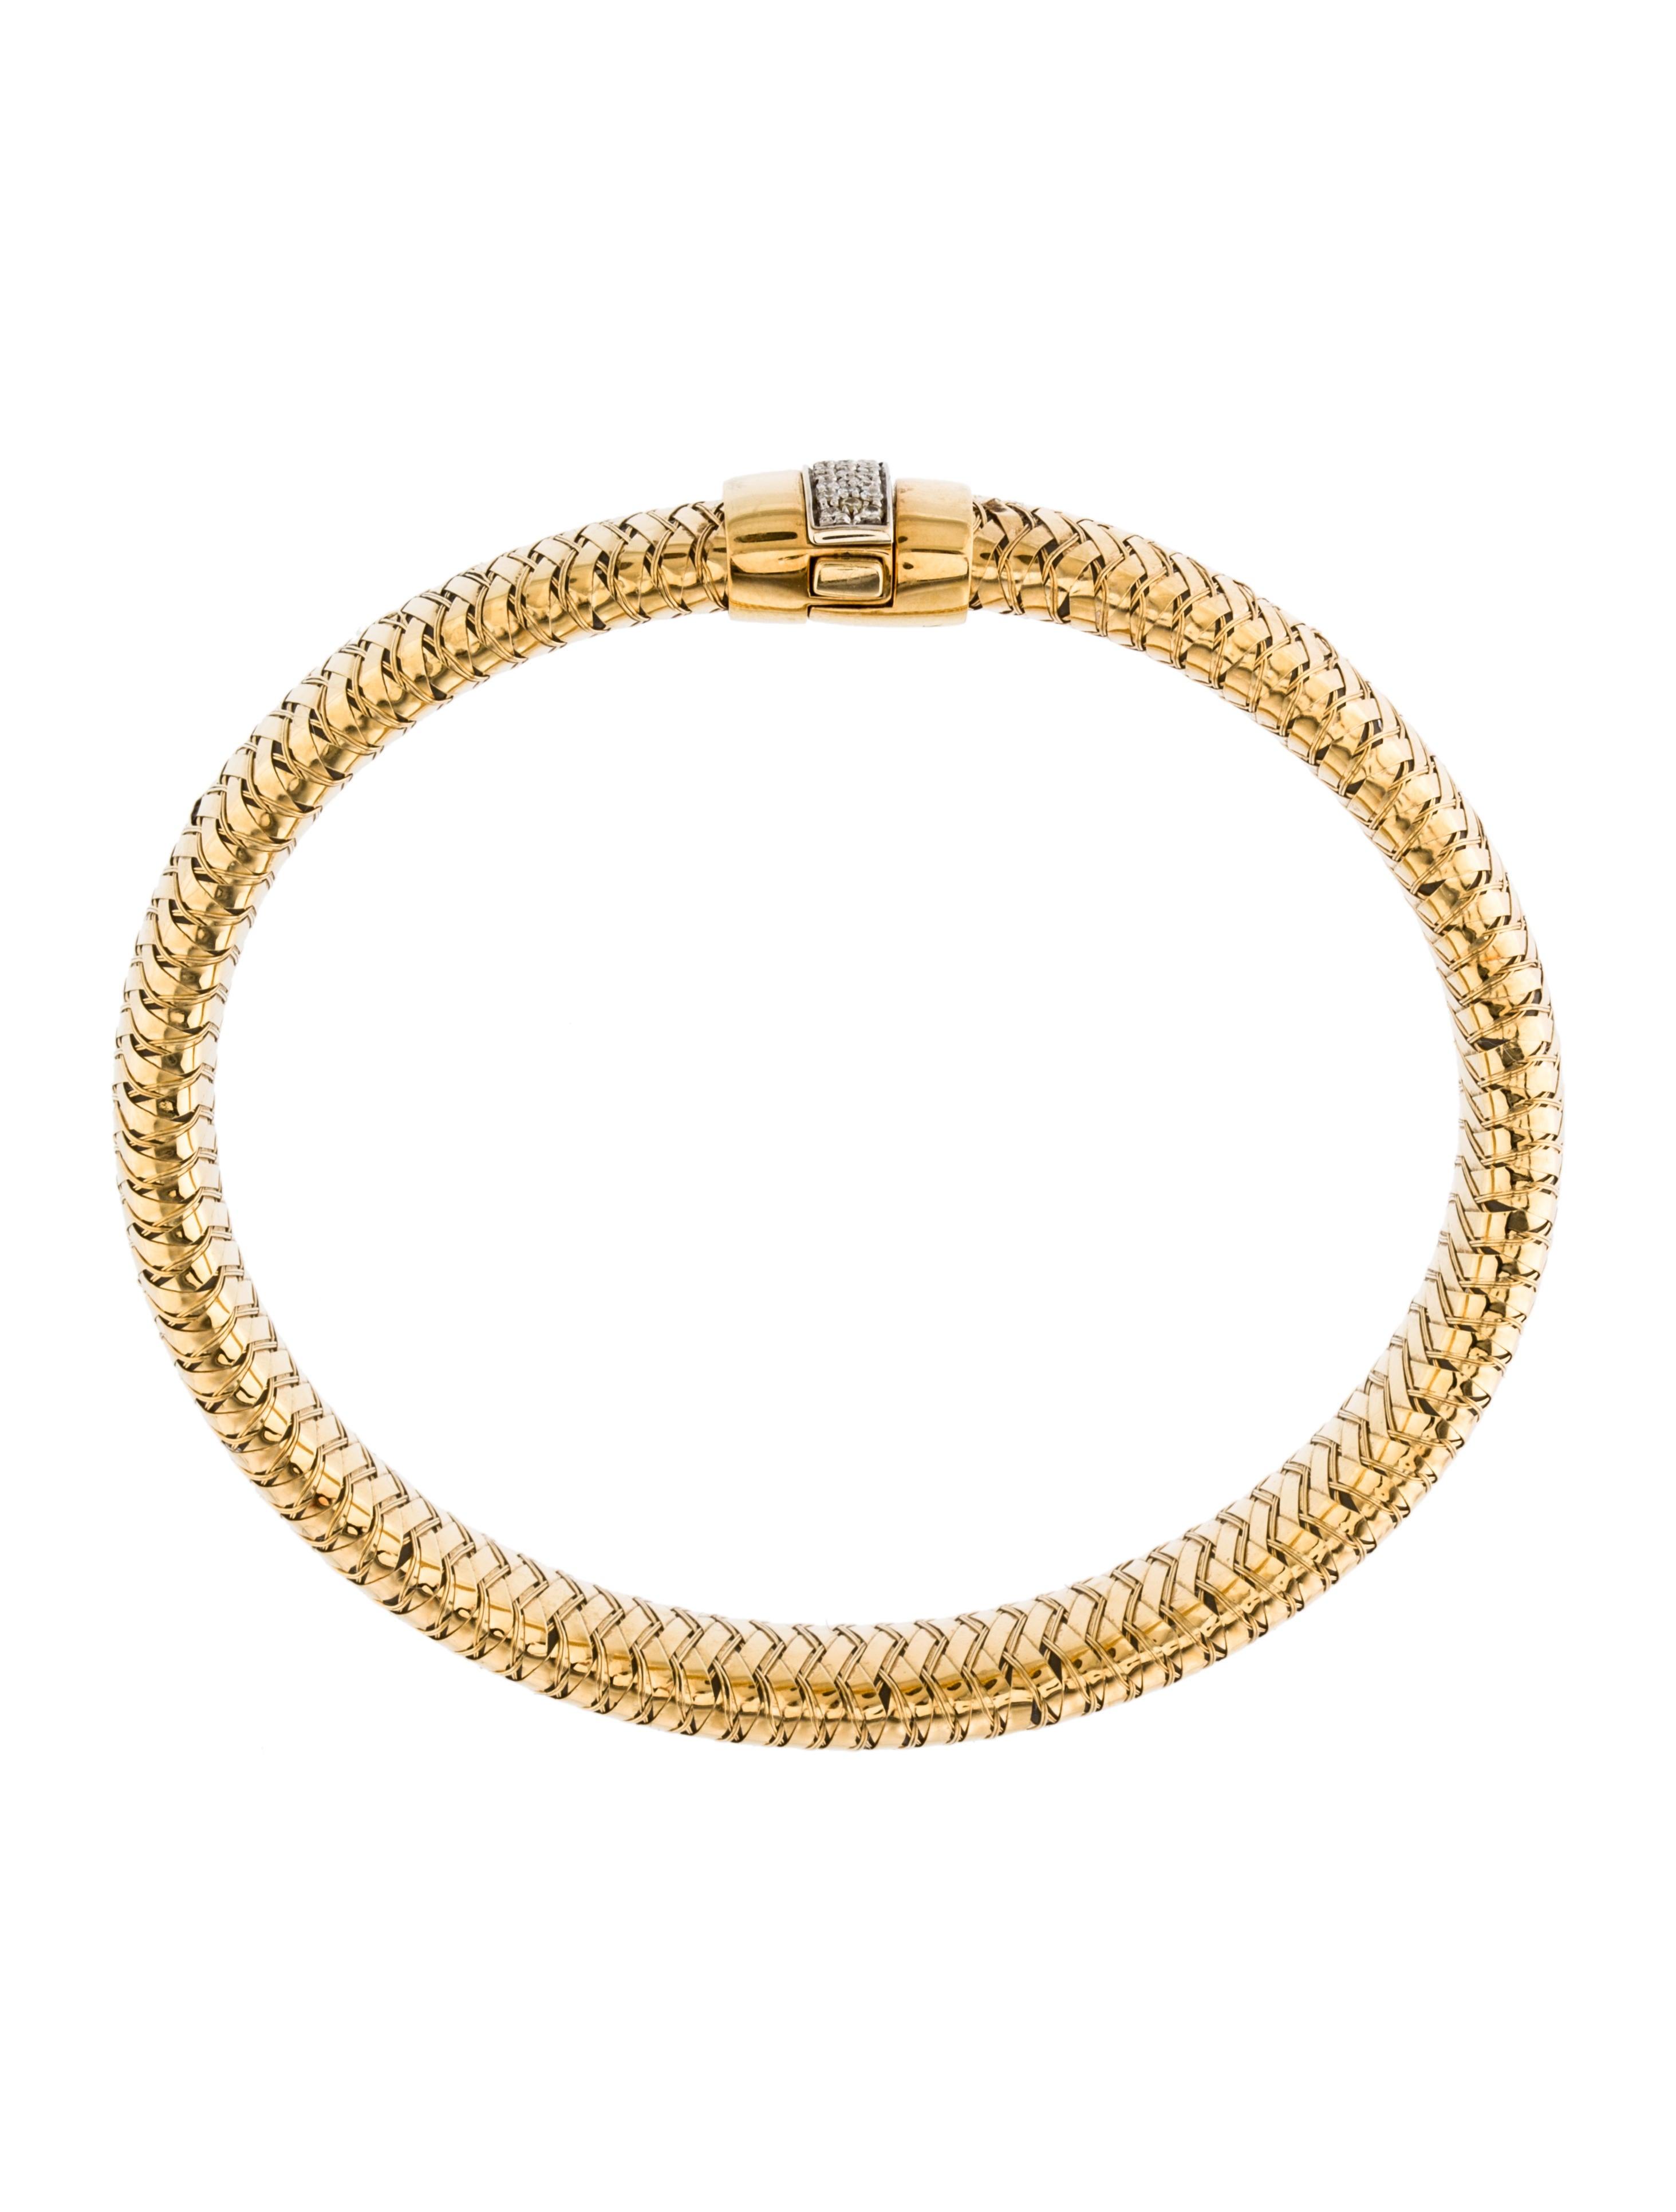 Diamond Anklet With Toe Ring Lc00035 In Anklets From: Roberto Coin Diamond Primavera Bracelet